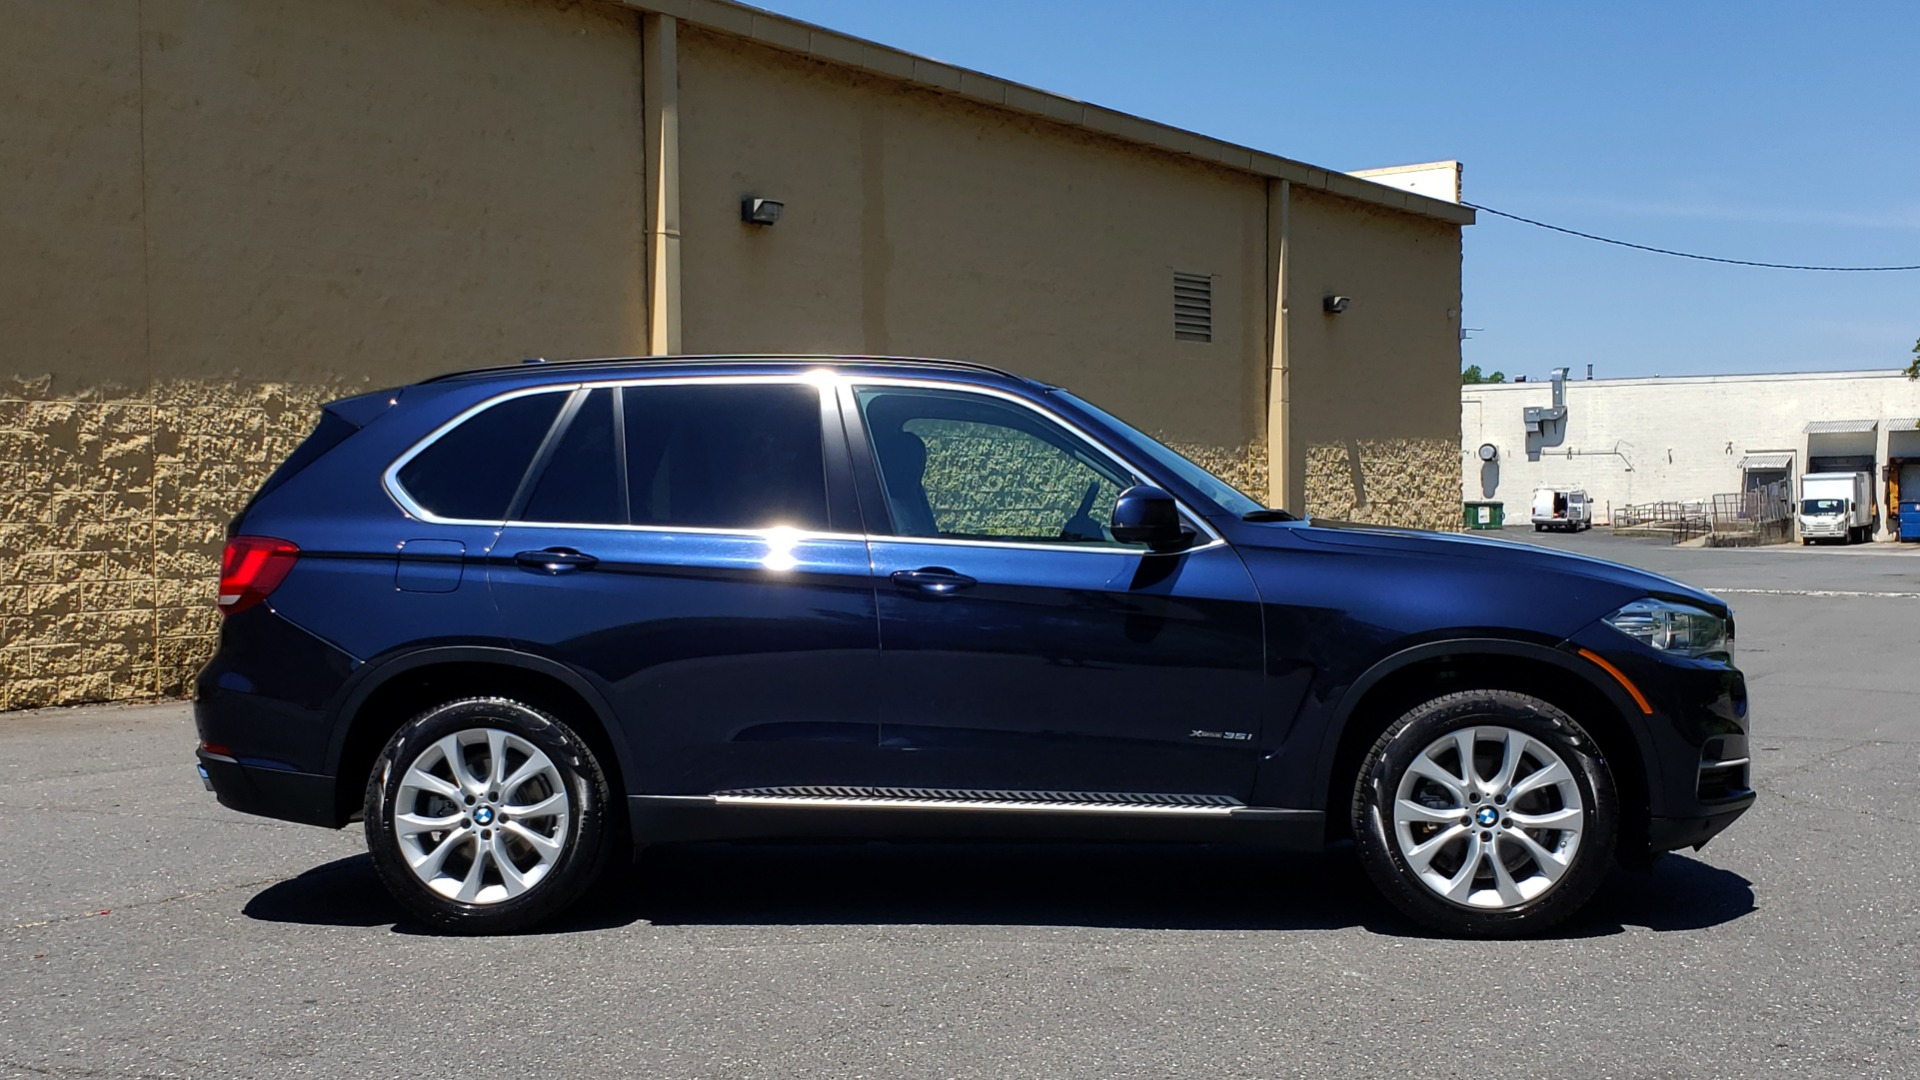 Used 2016 BMW X5 XDRIVE35I / PREM PKG / NAV / DRVR ASST PLUS / REARVIEW for sale $25,765 at Formula Imports in Charlotte NC 28227 5